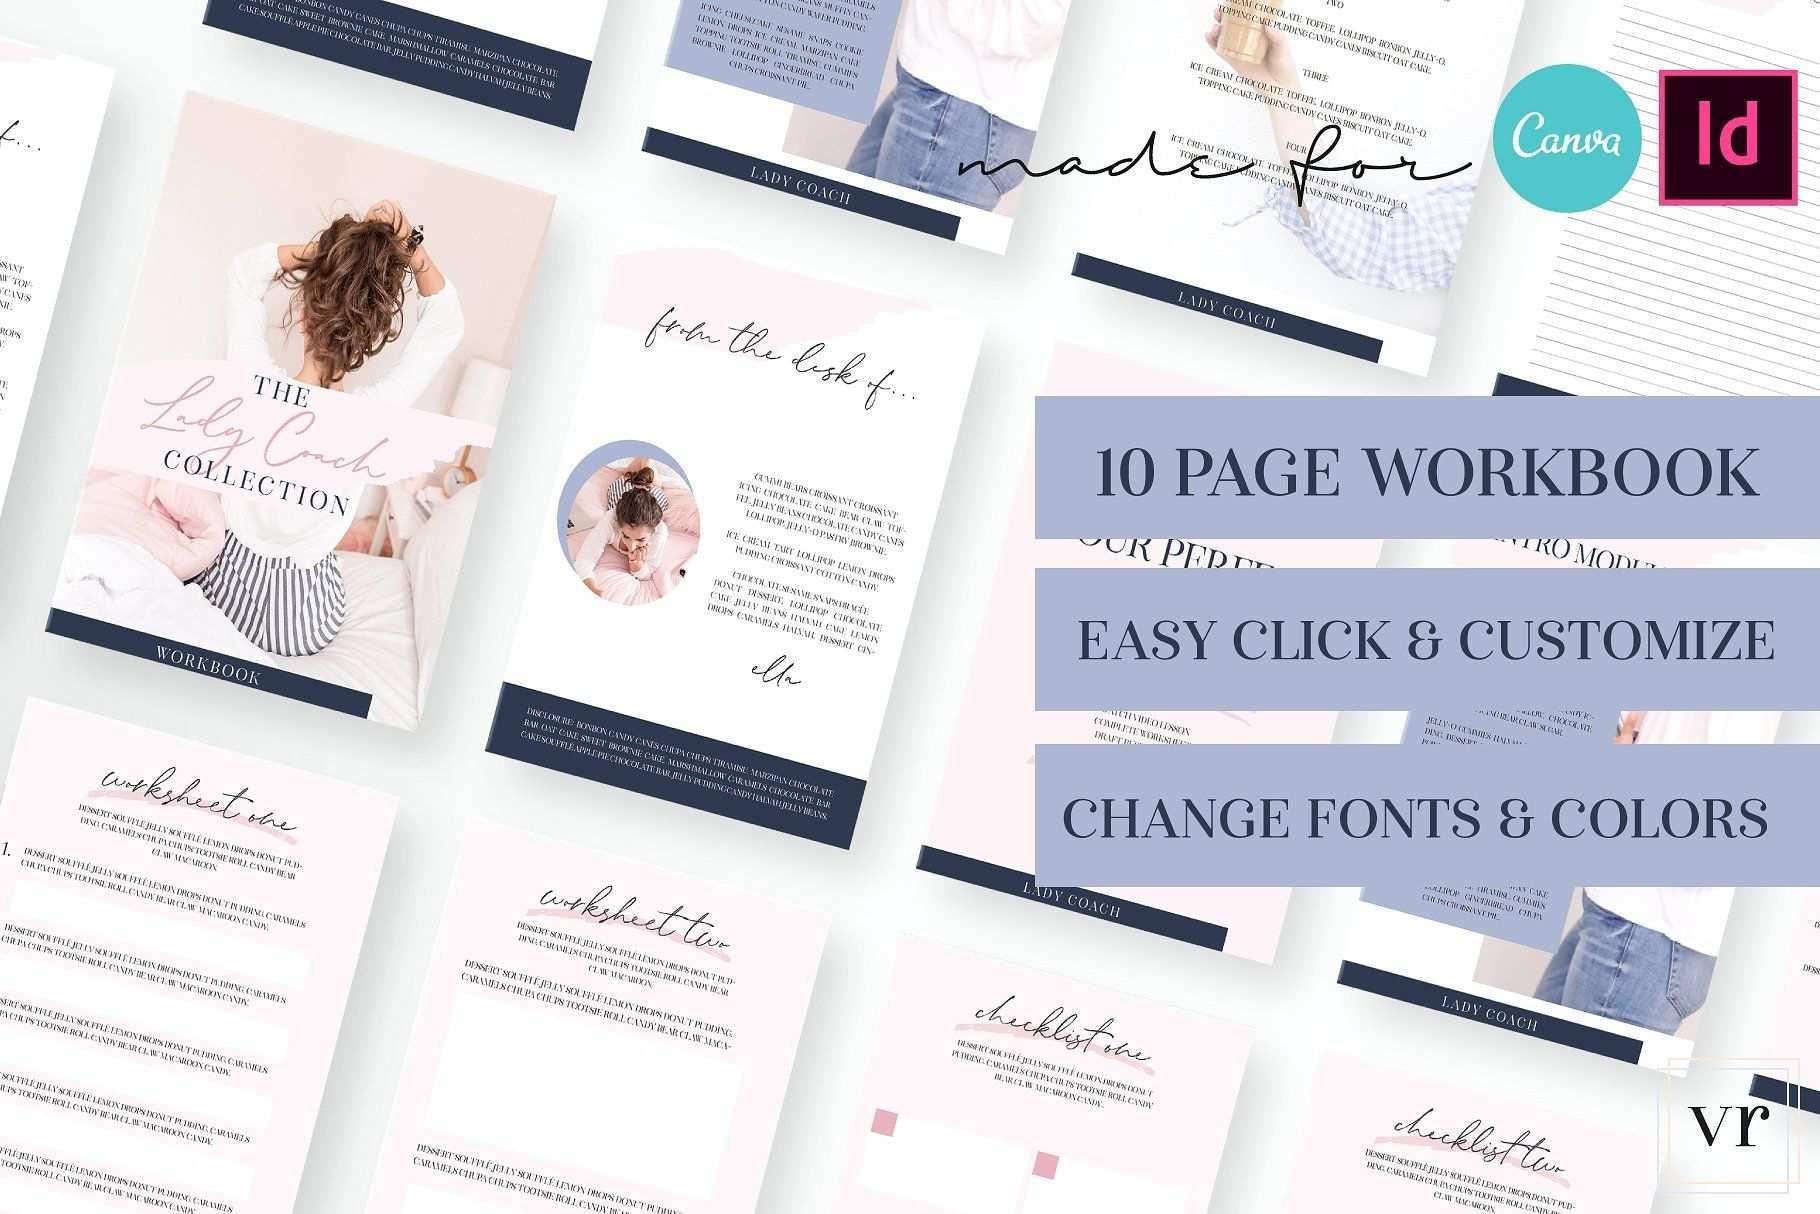 Lady Coach Workbook Canva Indesign Workbook Template Workbook Design Workbook